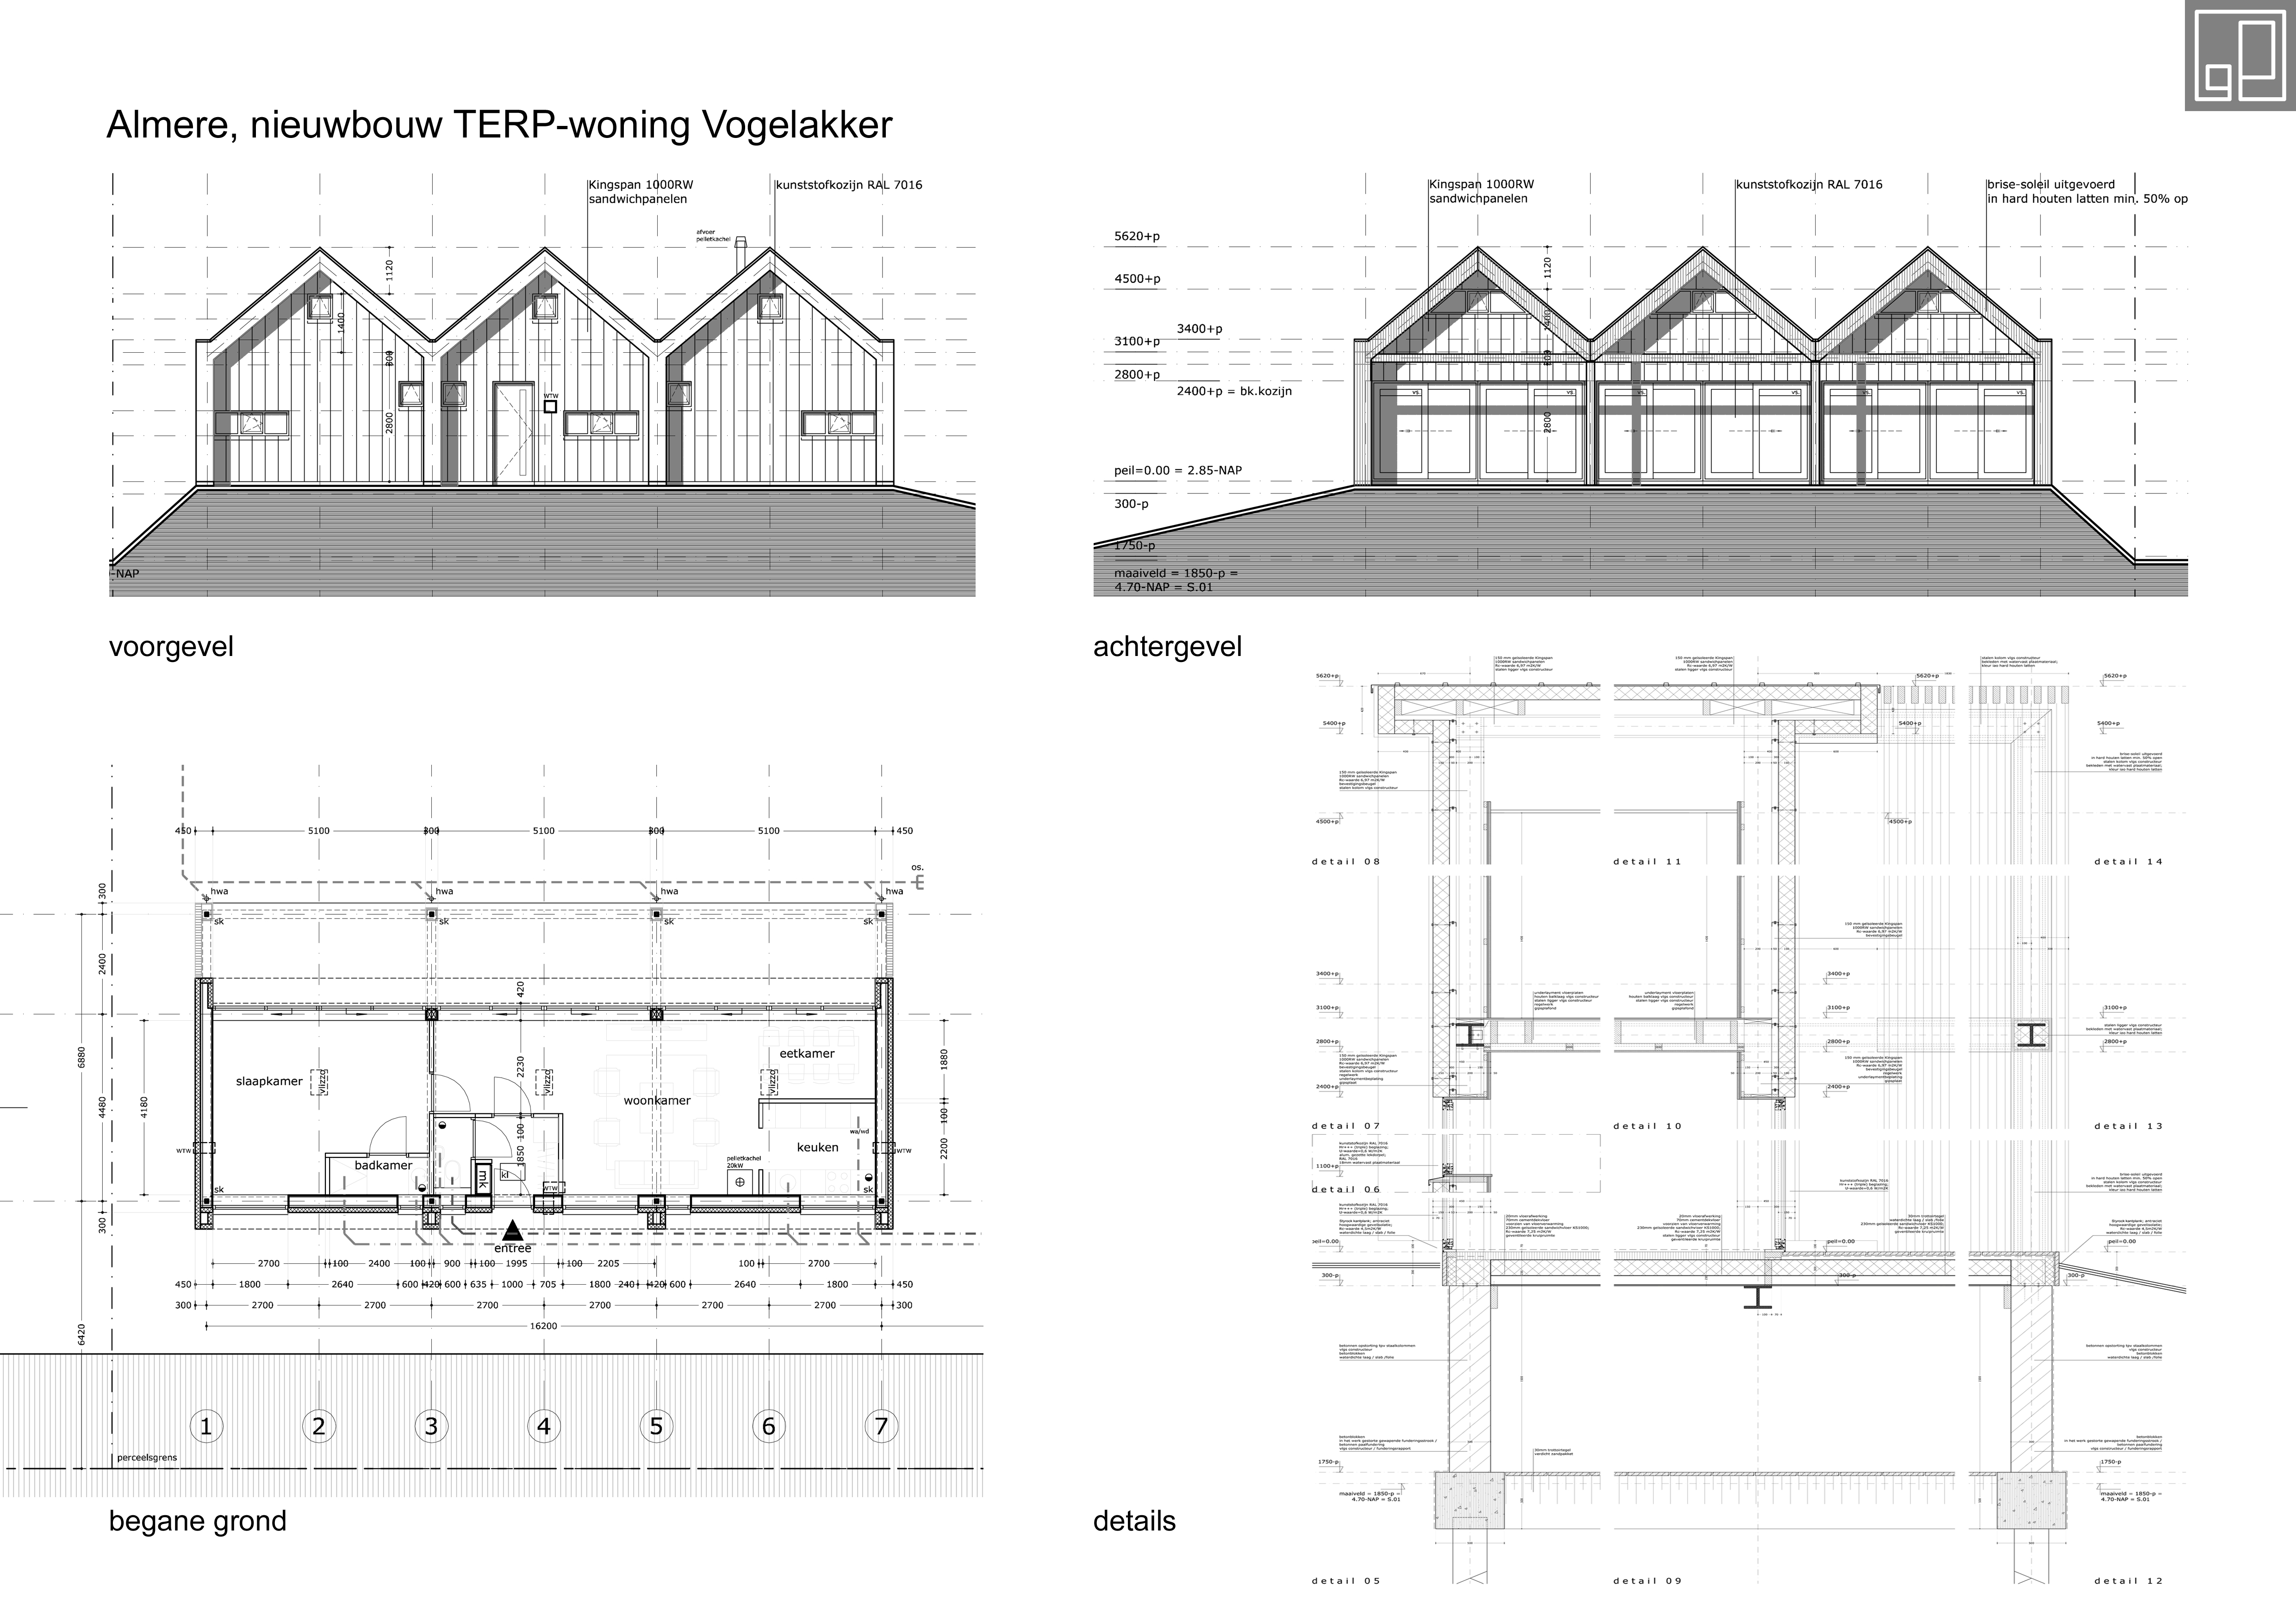 Nieuwbouw TERP-woning Almere